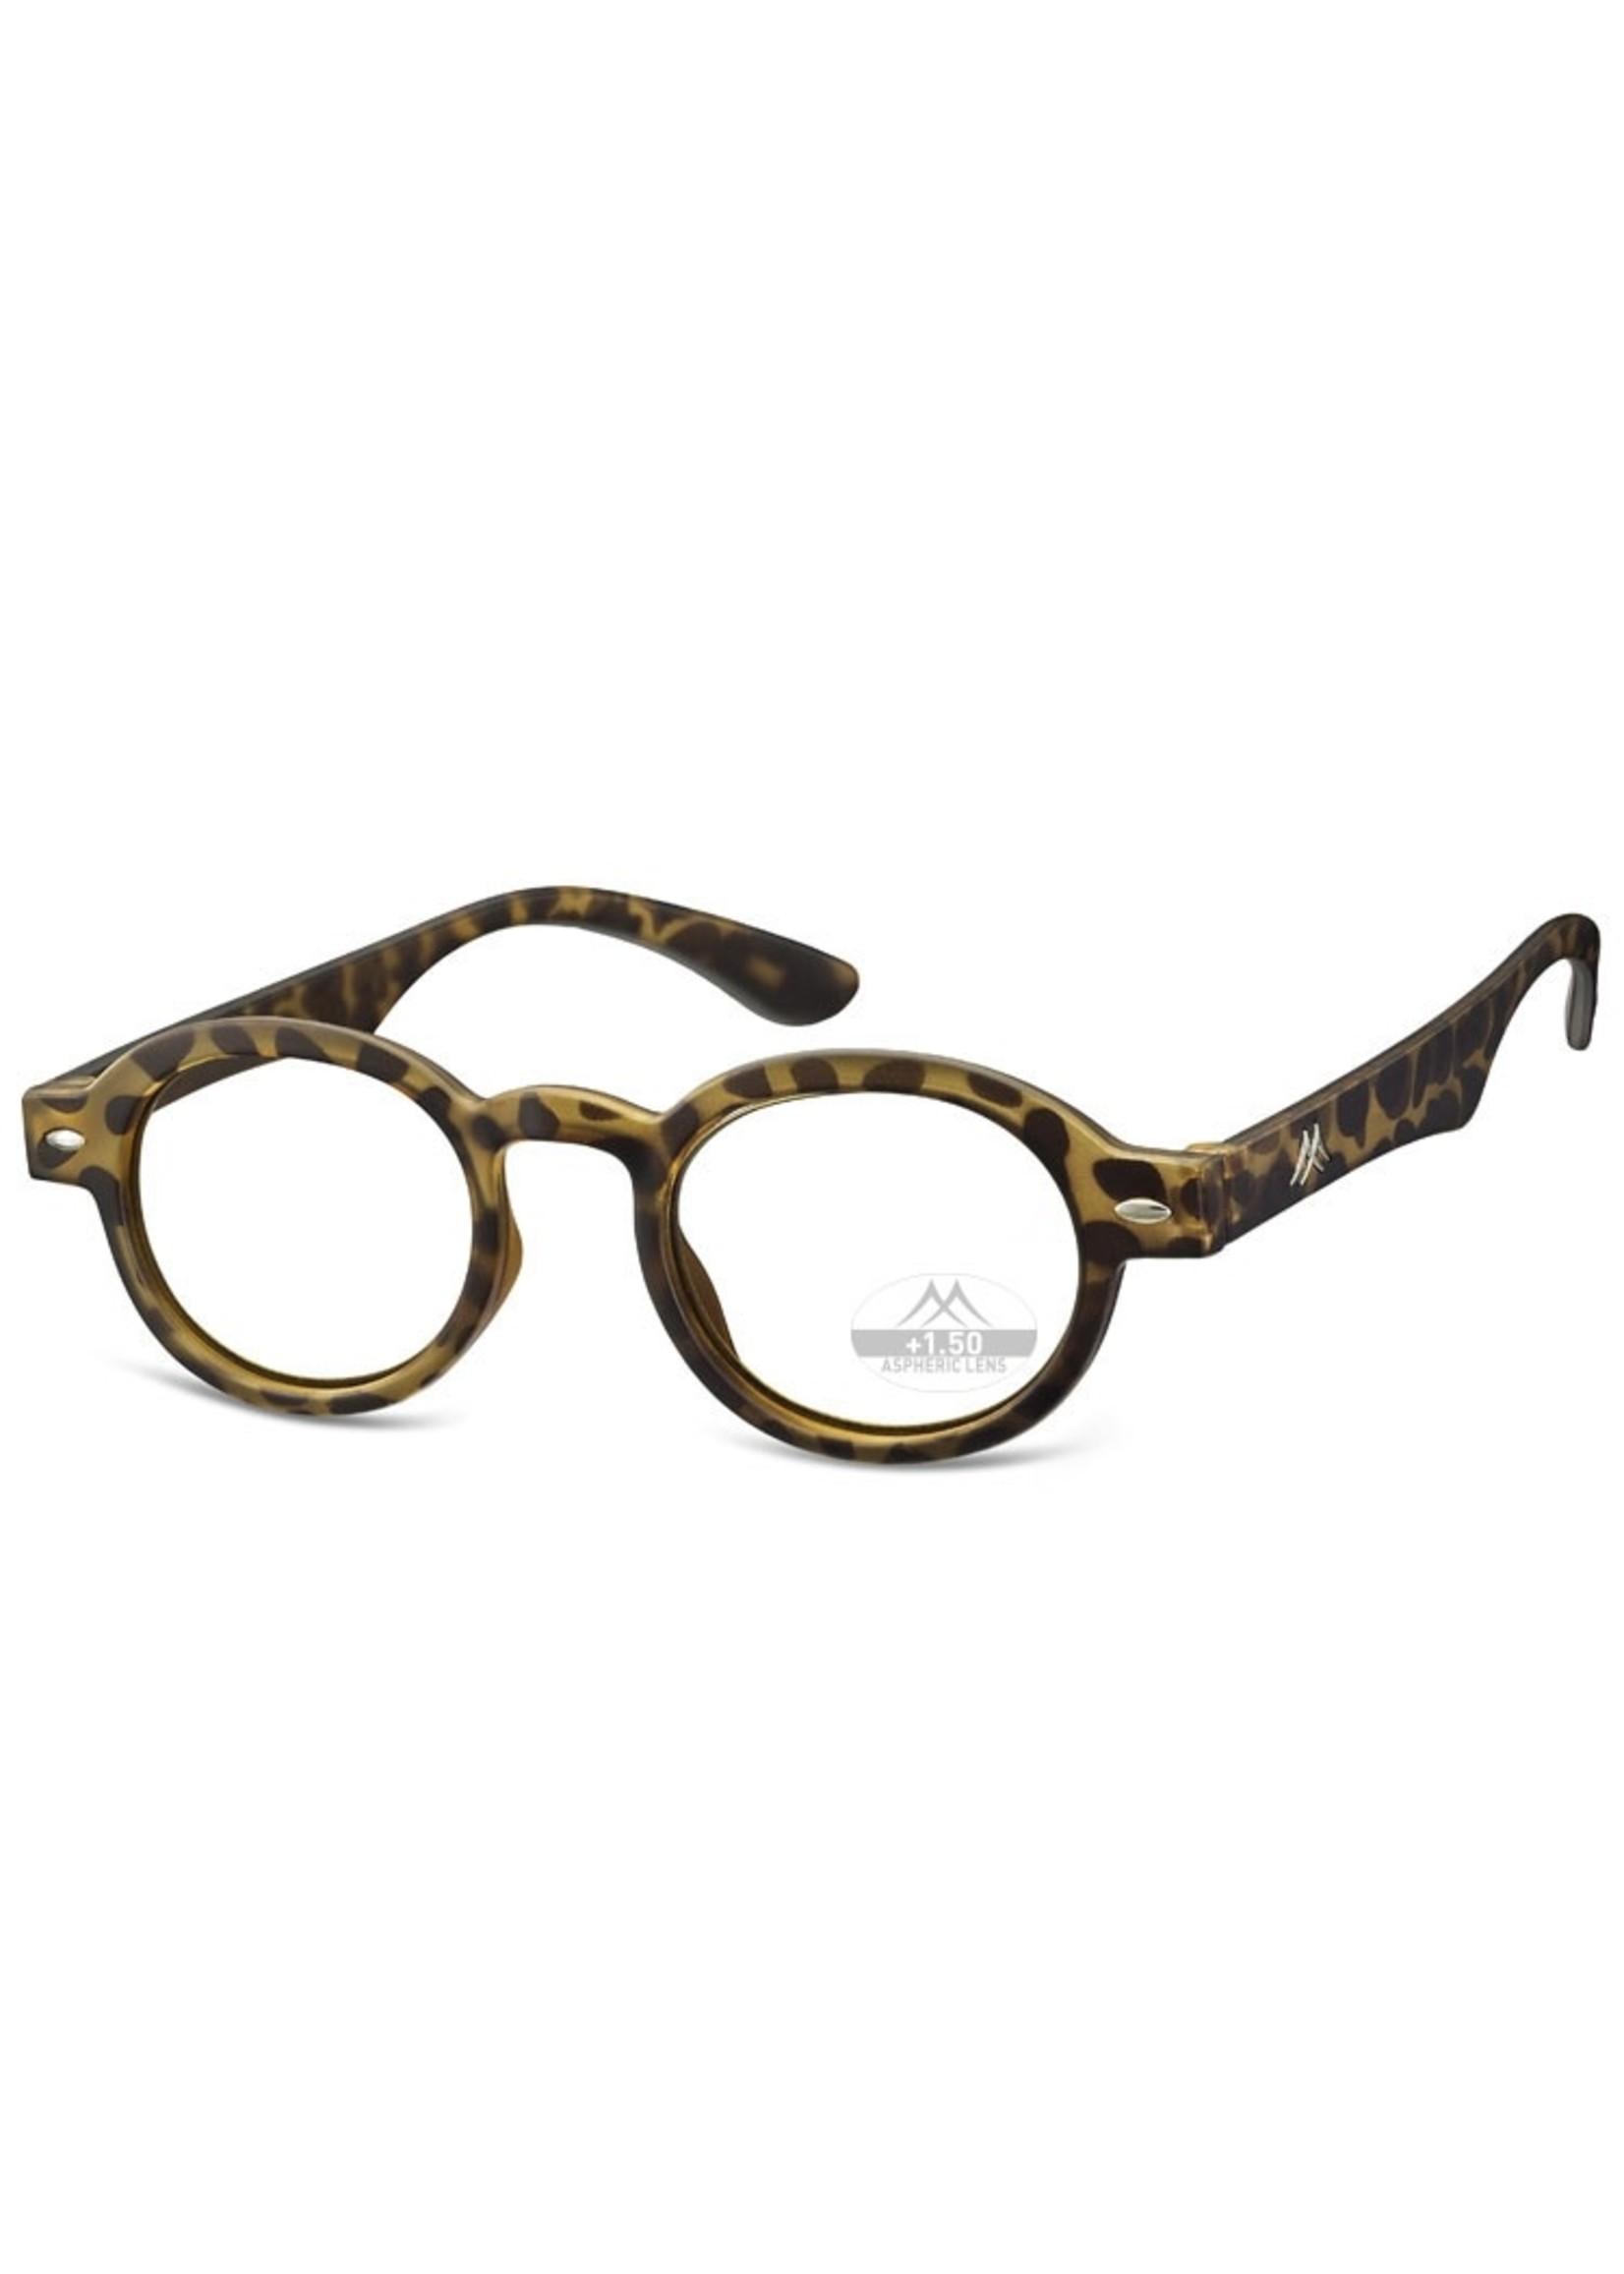 Dokters leesbril in turtle/schildpad